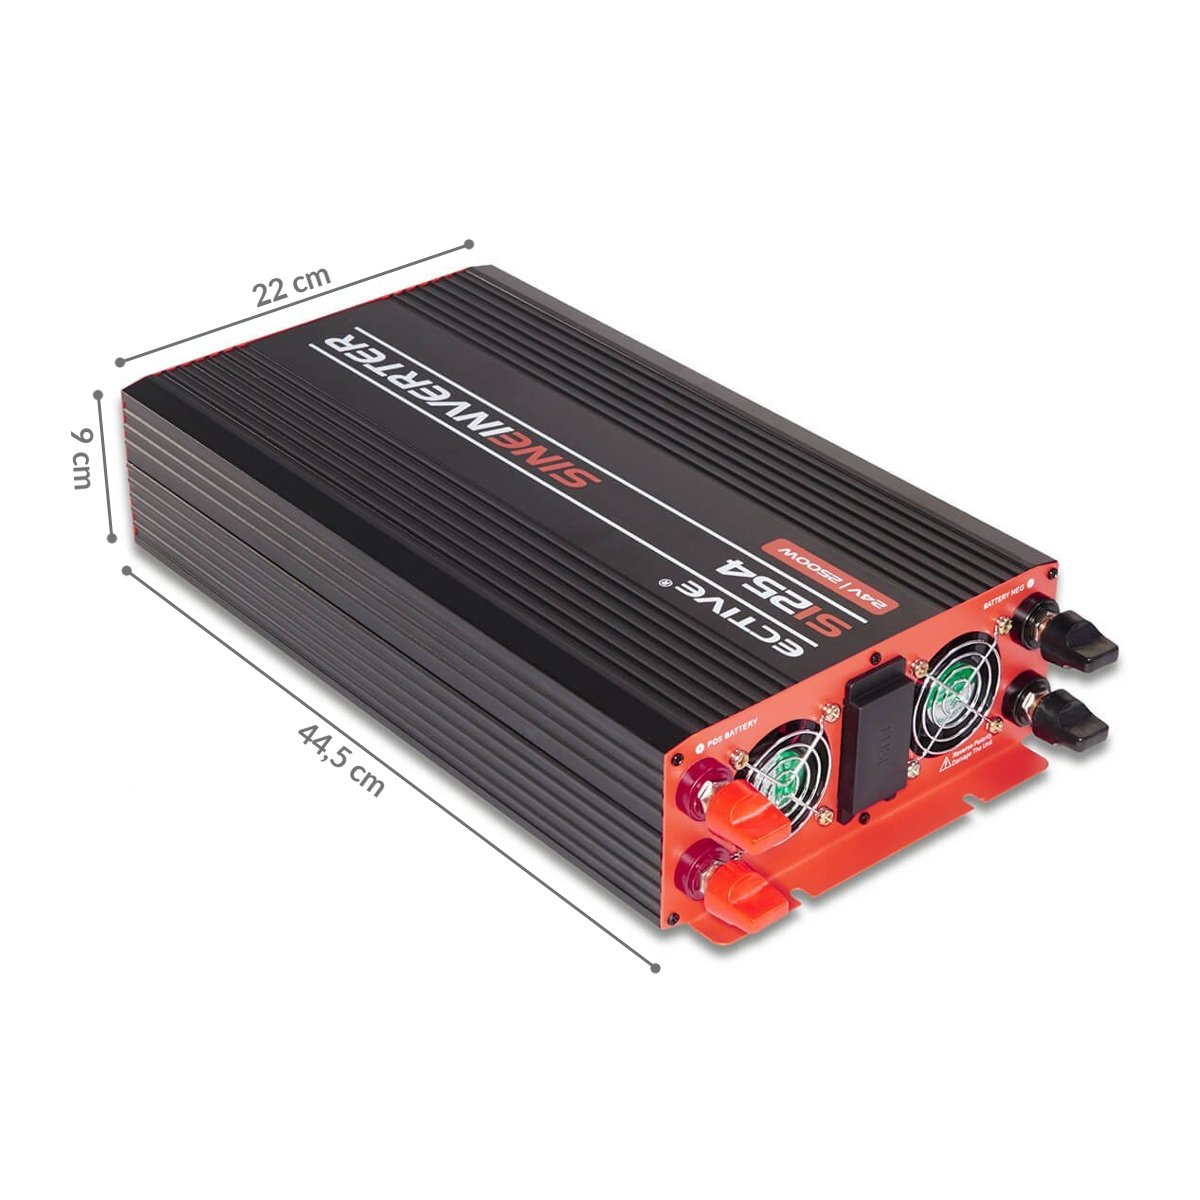 ECTIVE Serie SI caz | Inversor de onda sinusoidal 12V a 230V | 2500W | Los transformadores de tensión, transformadores de corriente, convertidor de energía, ...